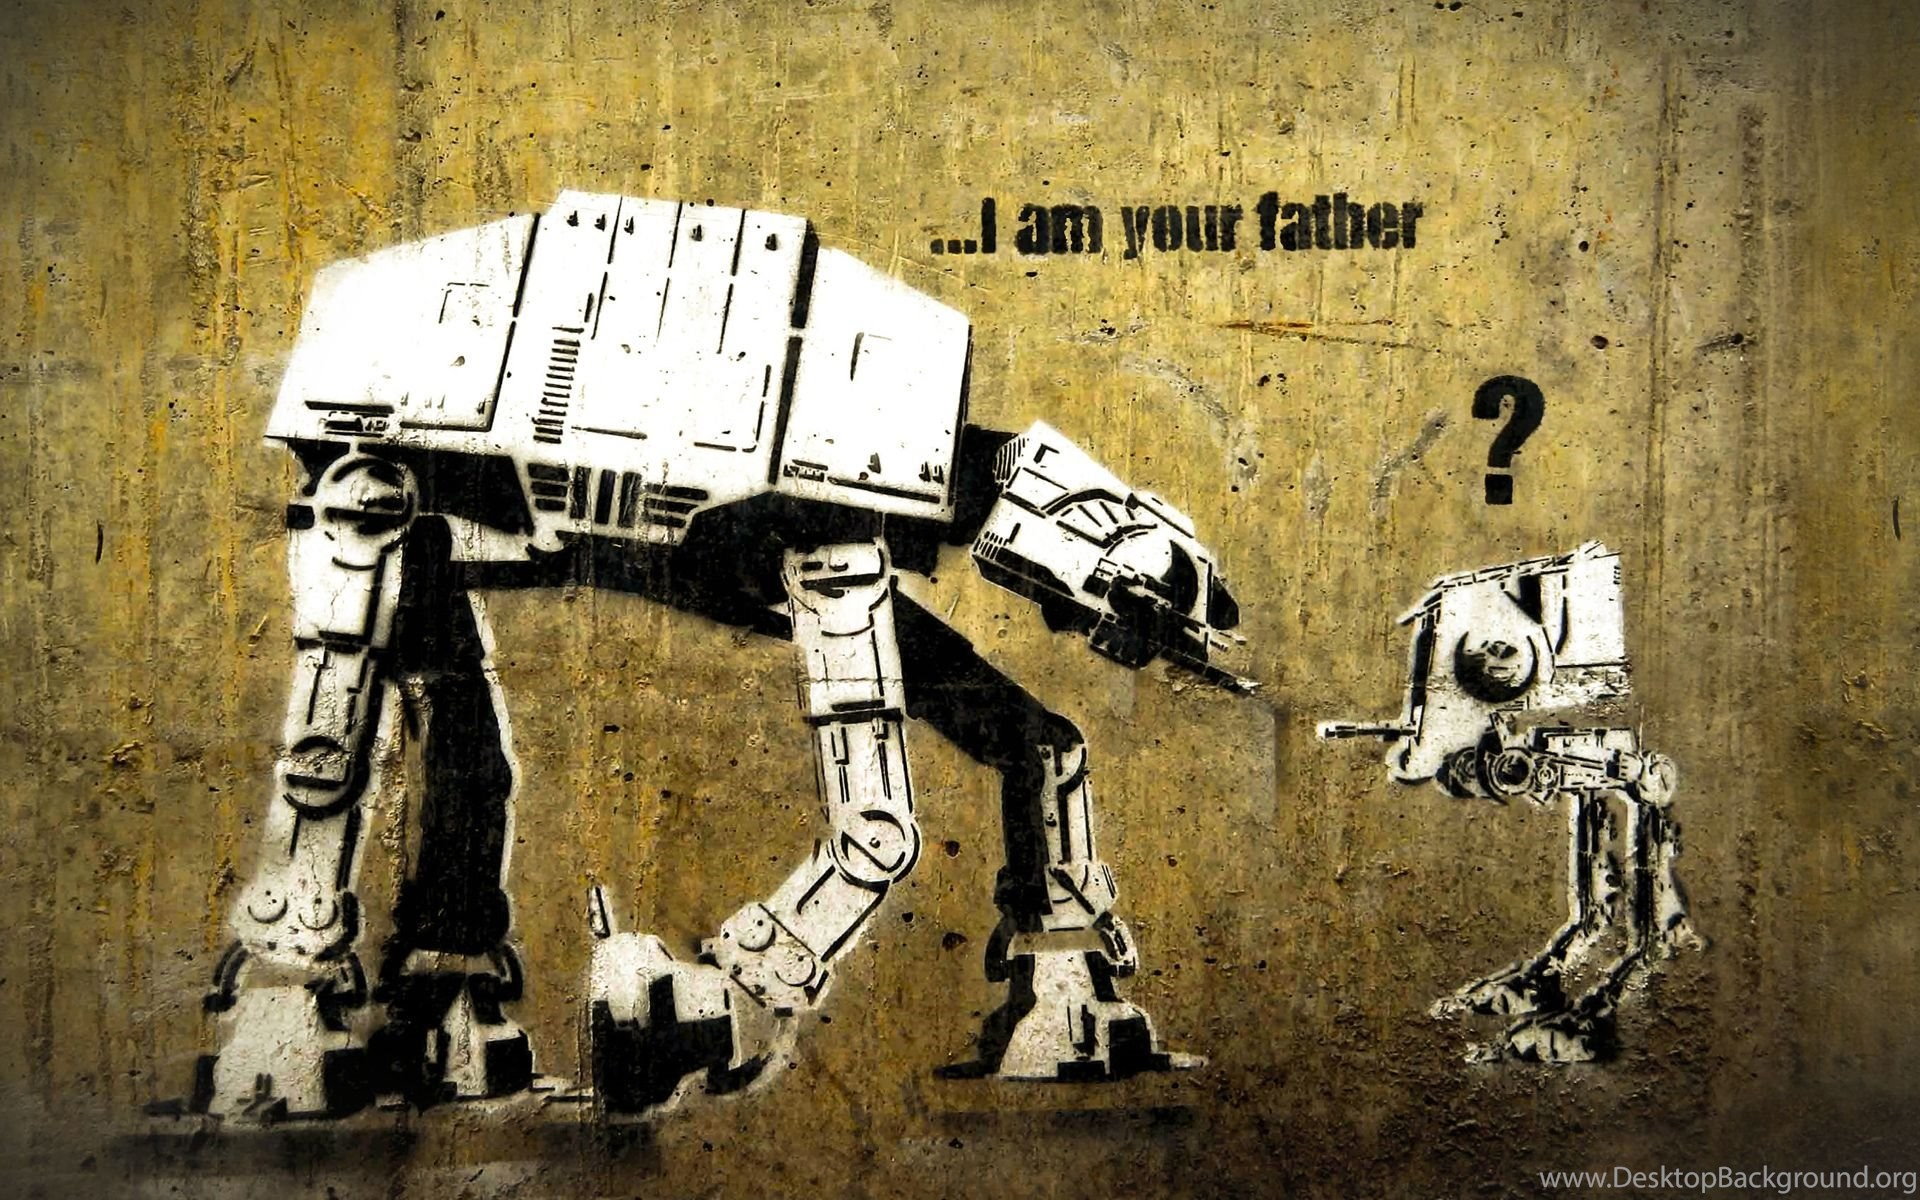 Star Wars Movie Wallpapers In Hd Darth Vader Luke Skywalker Yoda Desktop Background